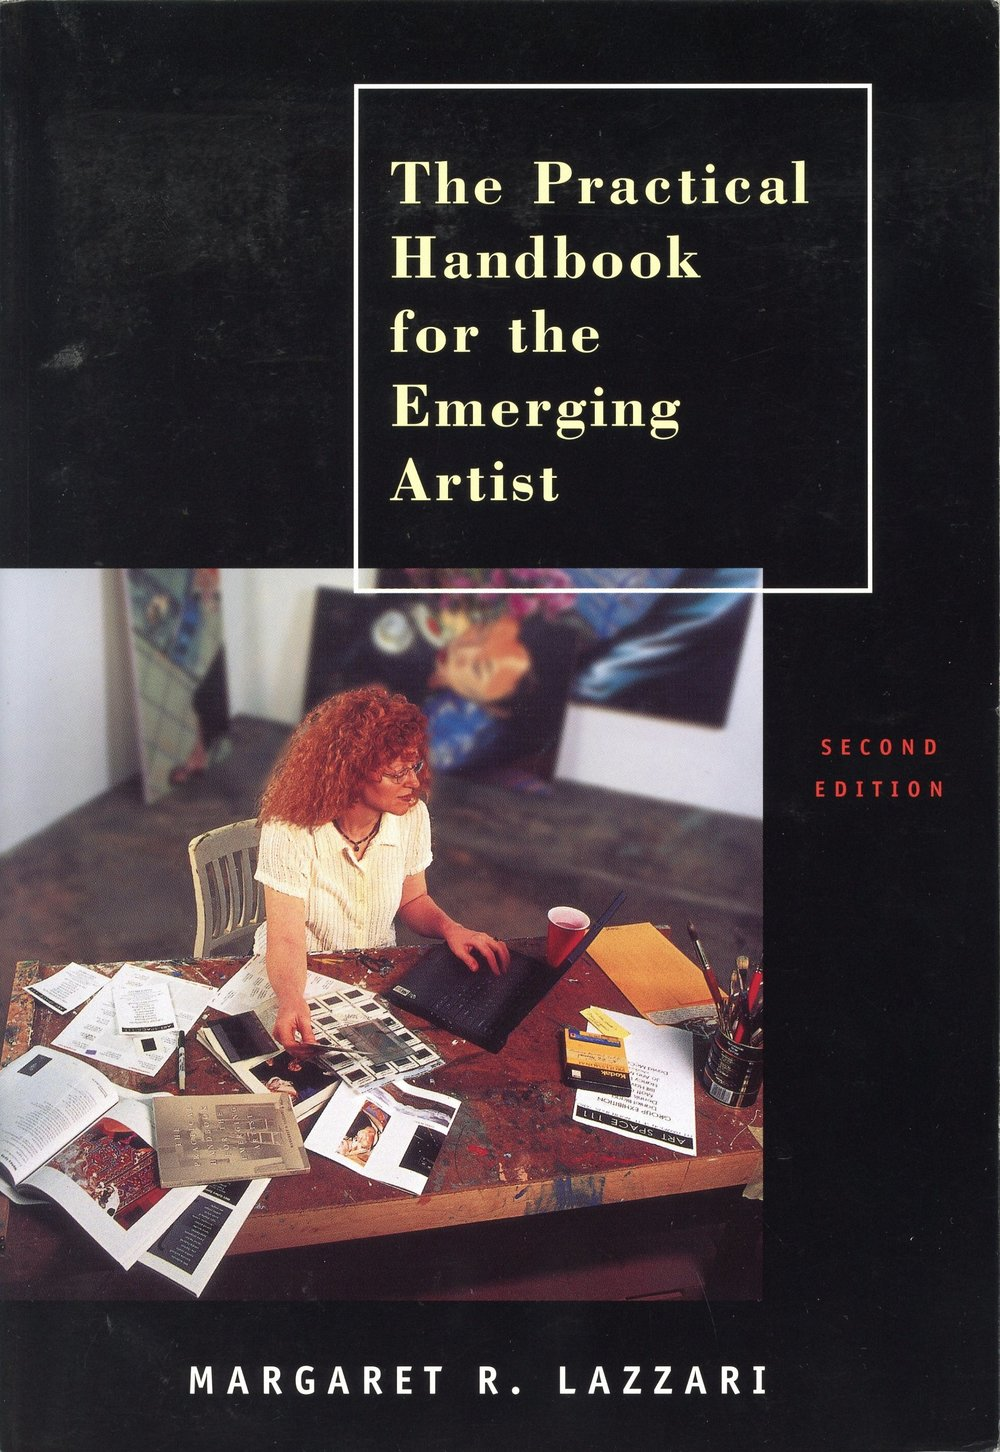 Practical handbook cover-2.jpg